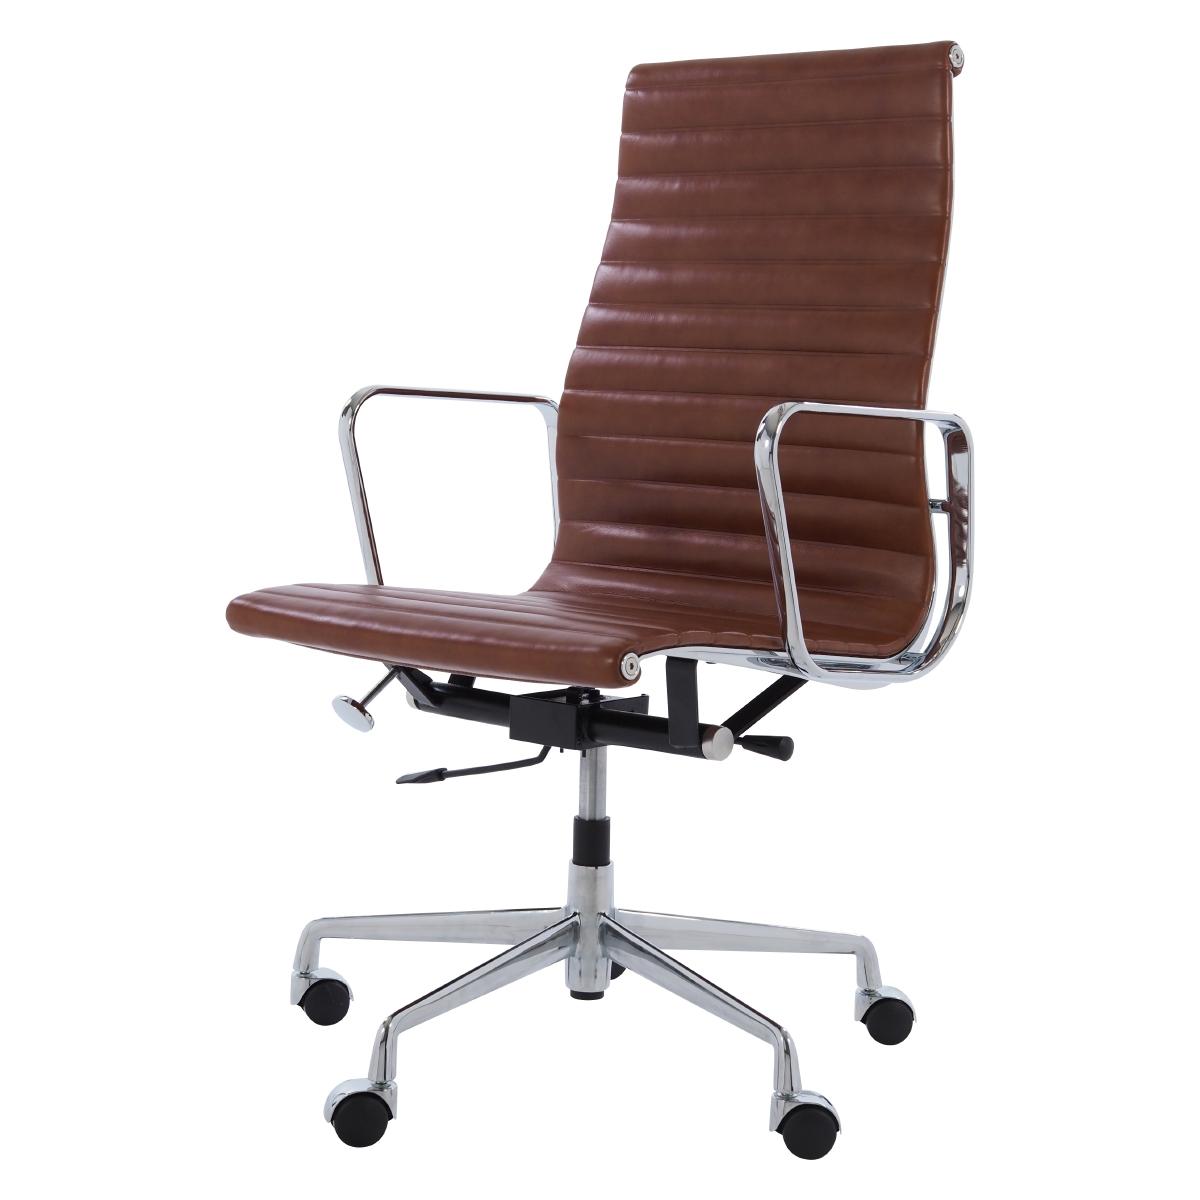 krzesło biurowe EA119 antyk